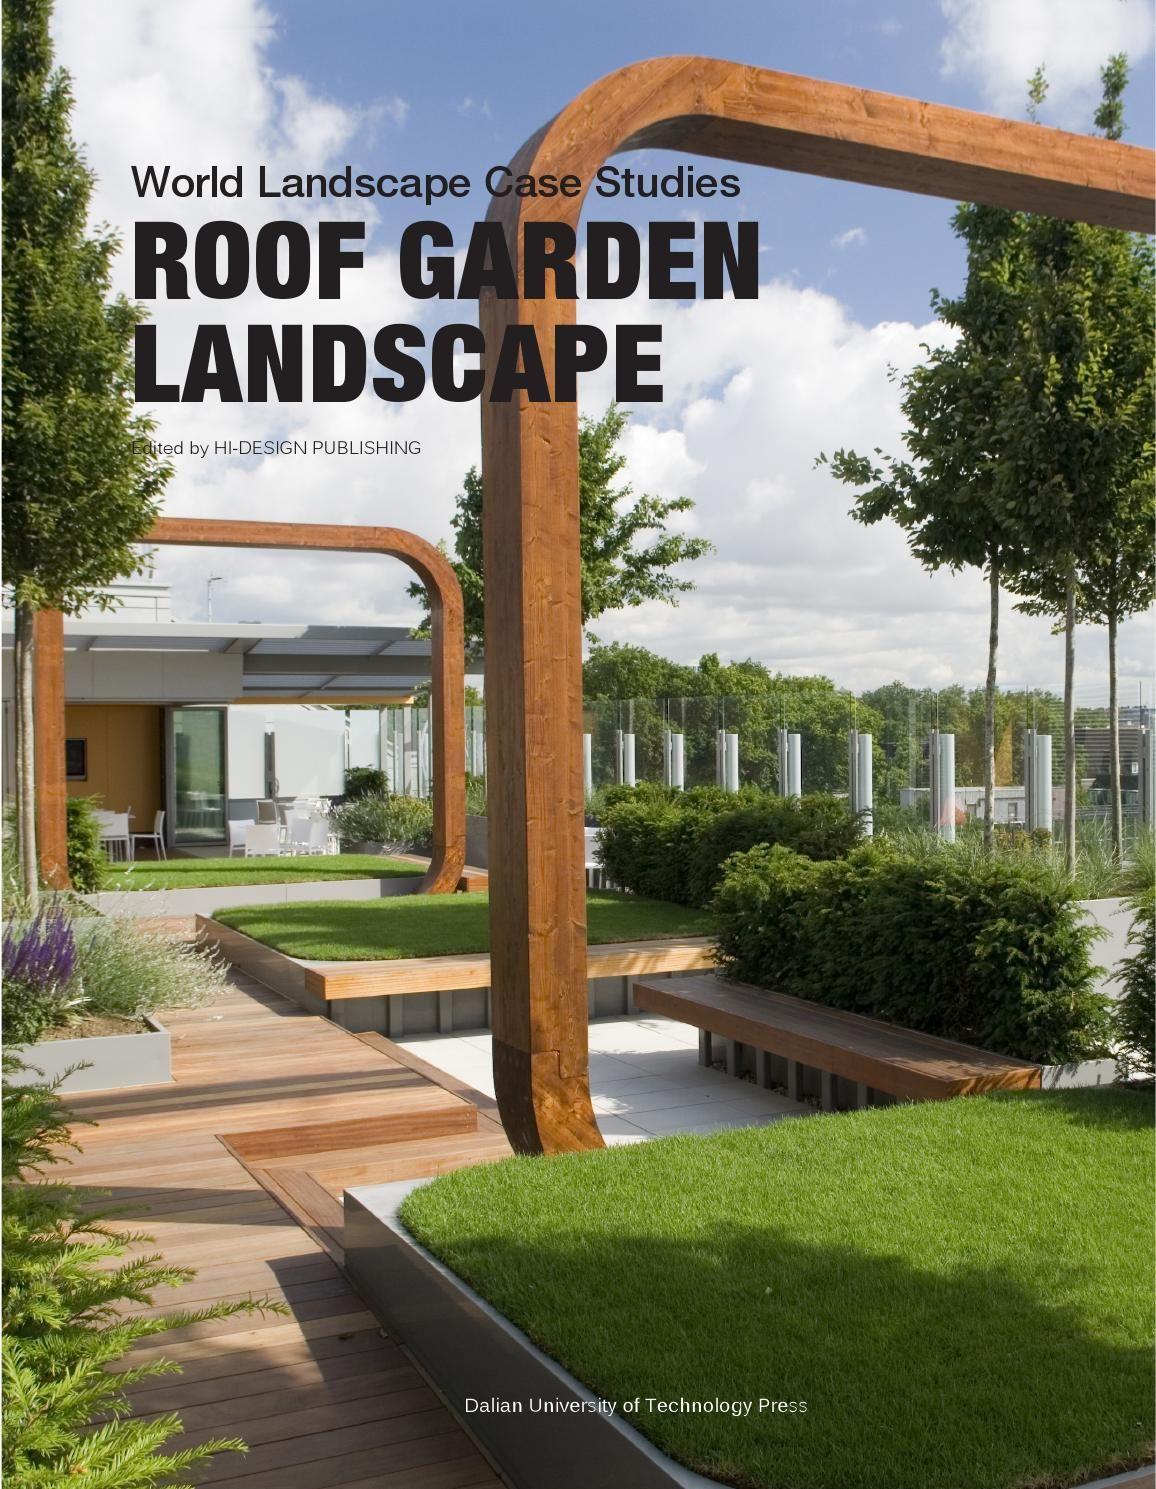 Roof Garden Landscape World Landscape Case Studies